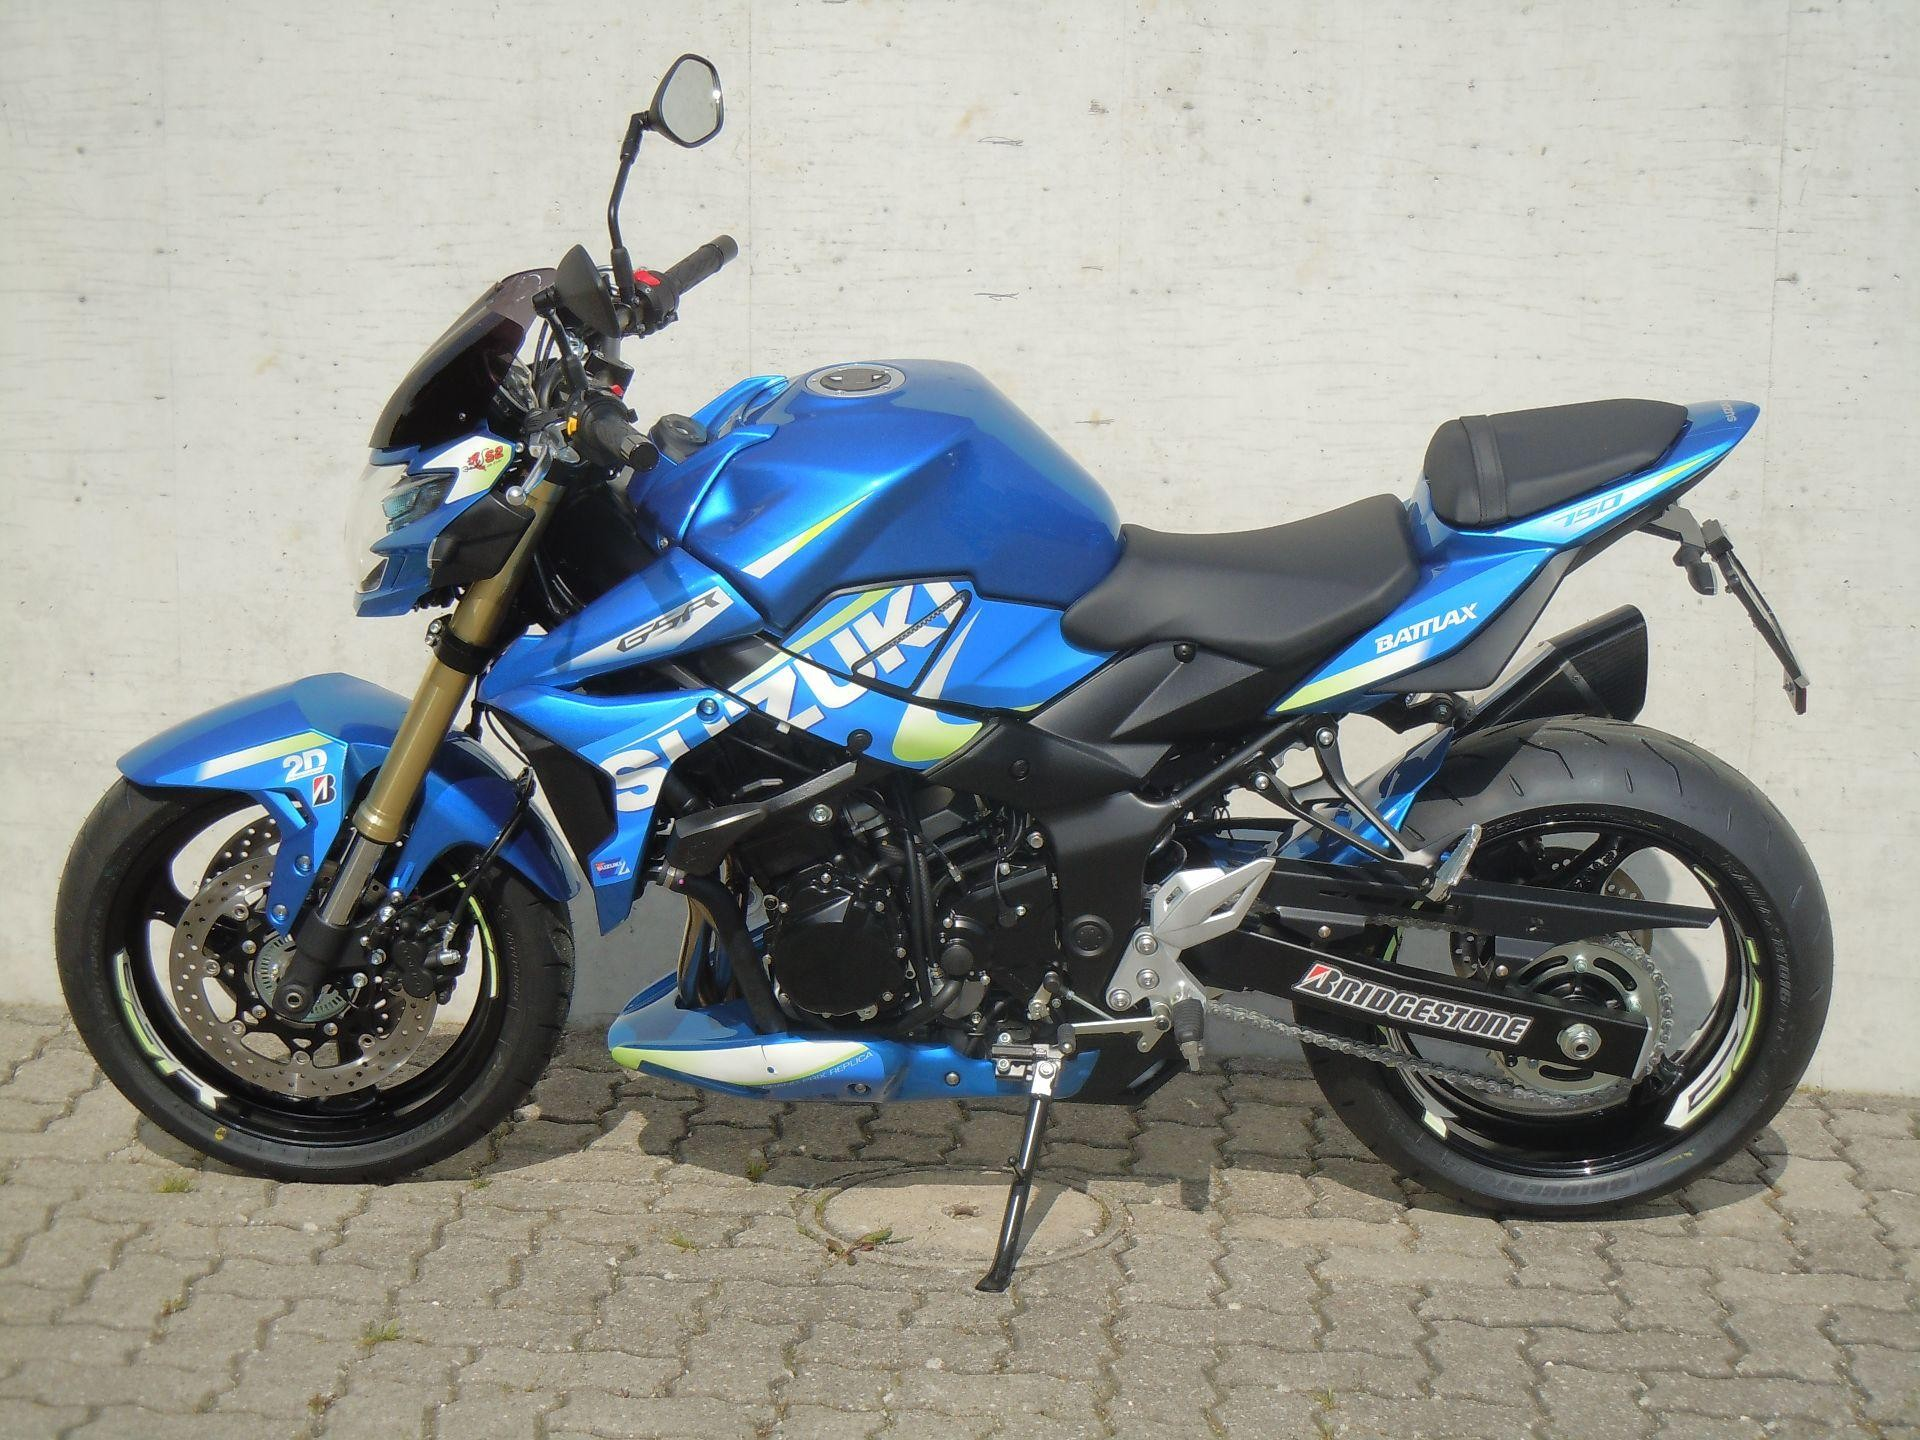 moto neuve acheter suzuki gsr 750 a moto gp edition rolf gall superbikes ag b tzberg. Black Bedroom Furniture Sets. Home Design Ideas